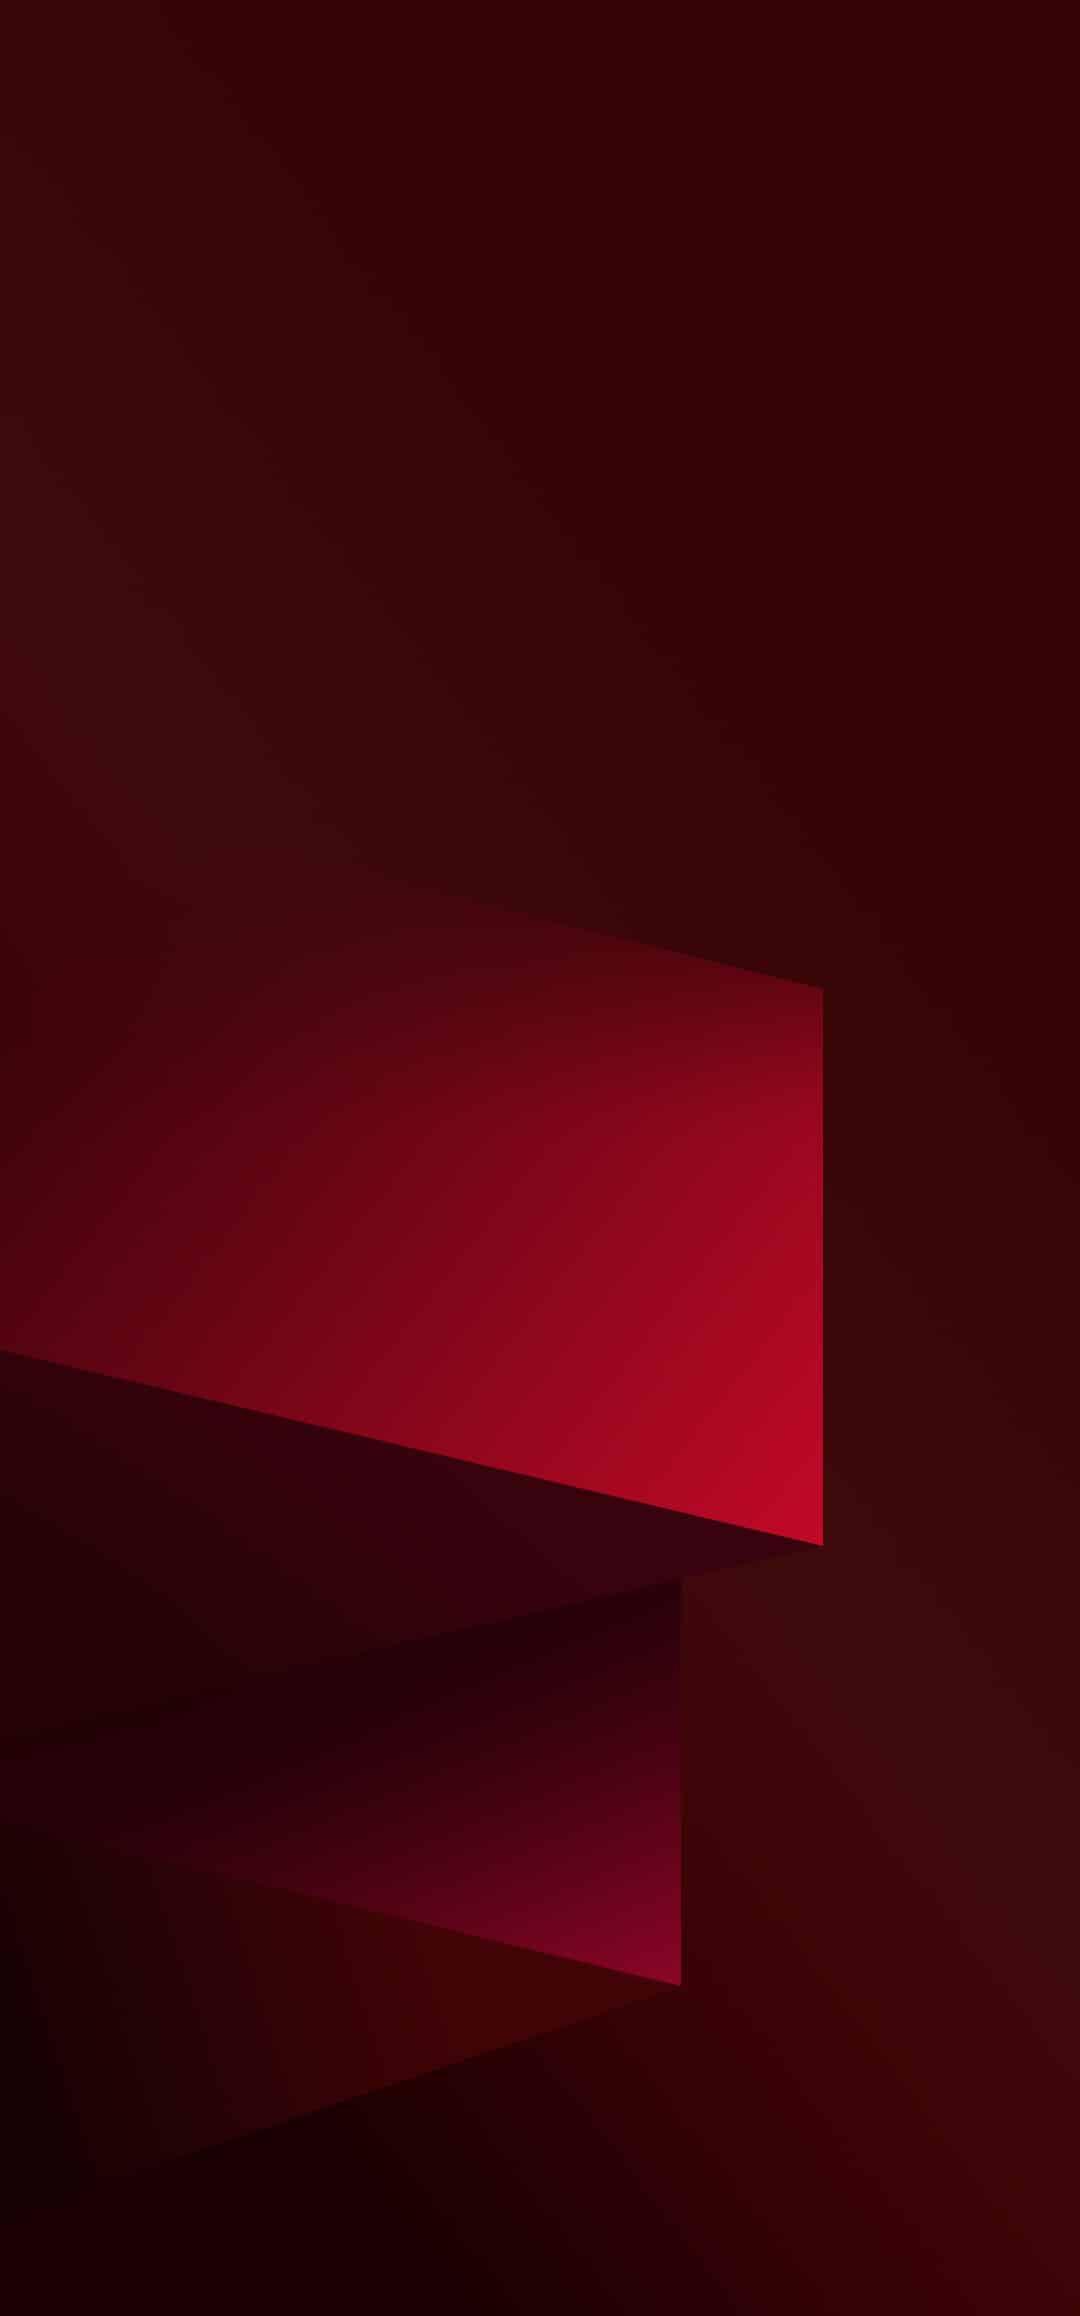 Download Vivo Nex Dual Display Edition Wallpapers Droidviews